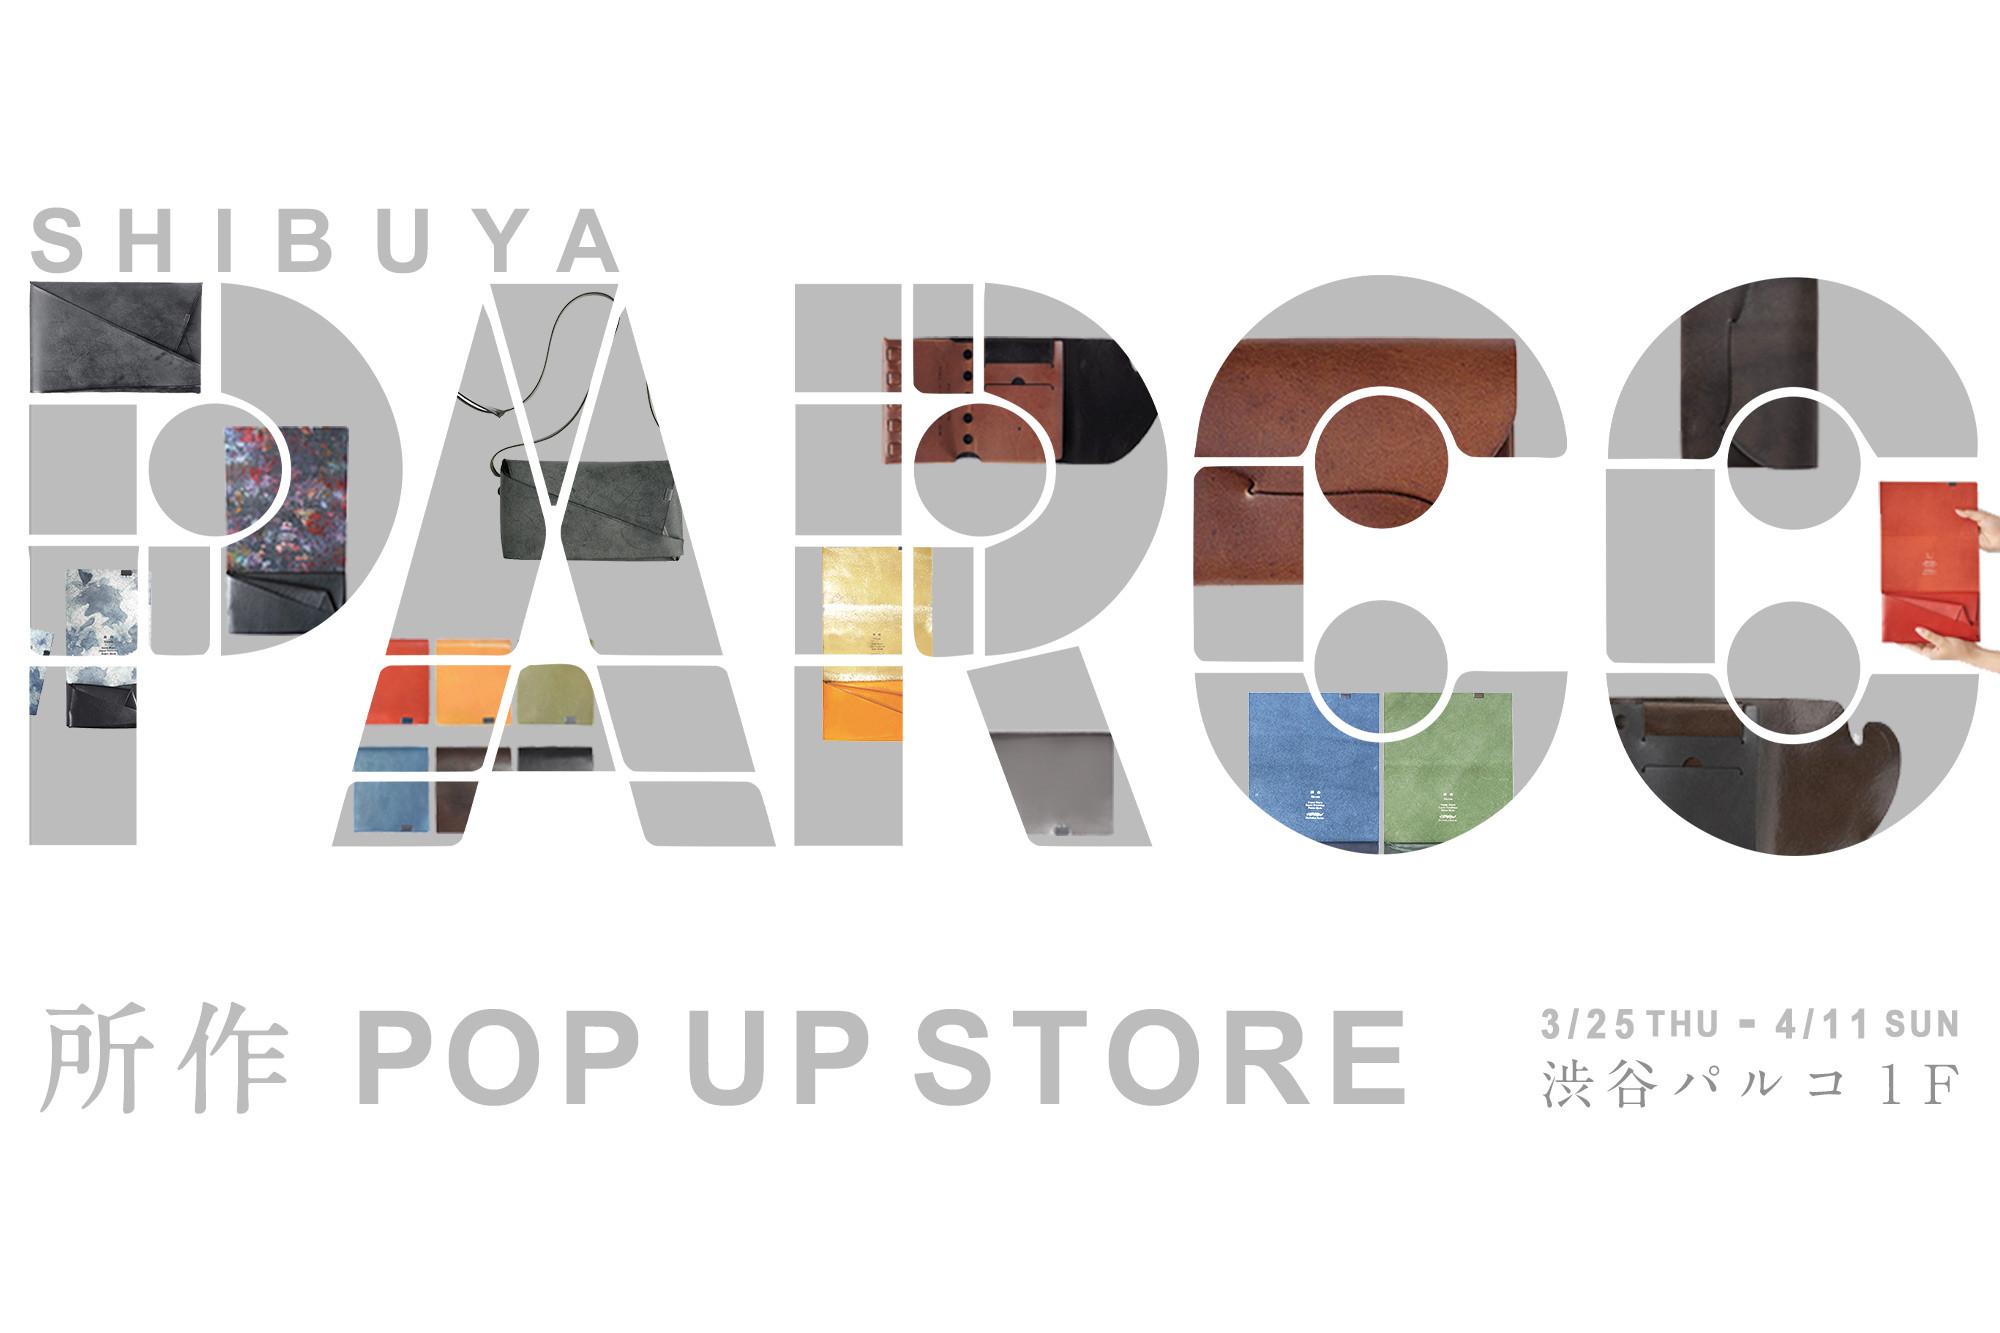 【 POP UP STORE 】のお知らせ